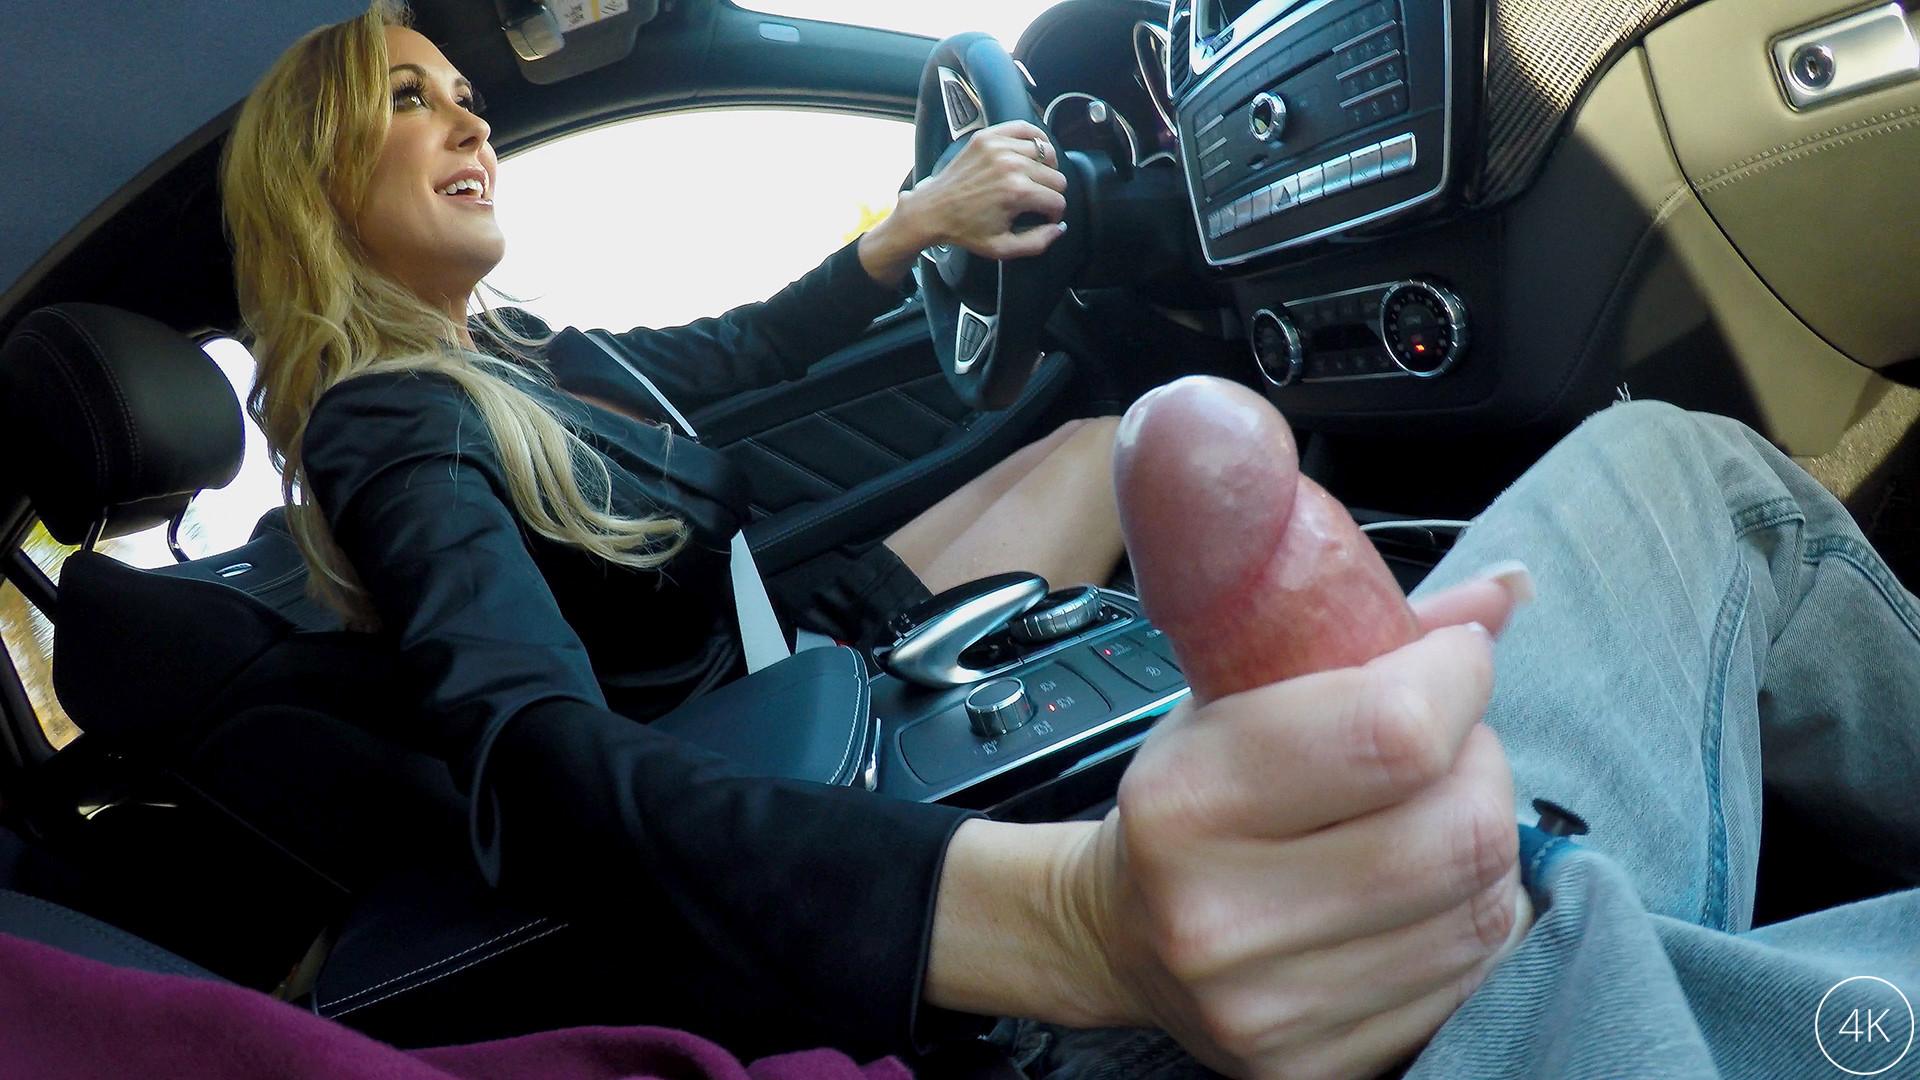 Download JulesJordan.com - Brandi Love: Test Drive